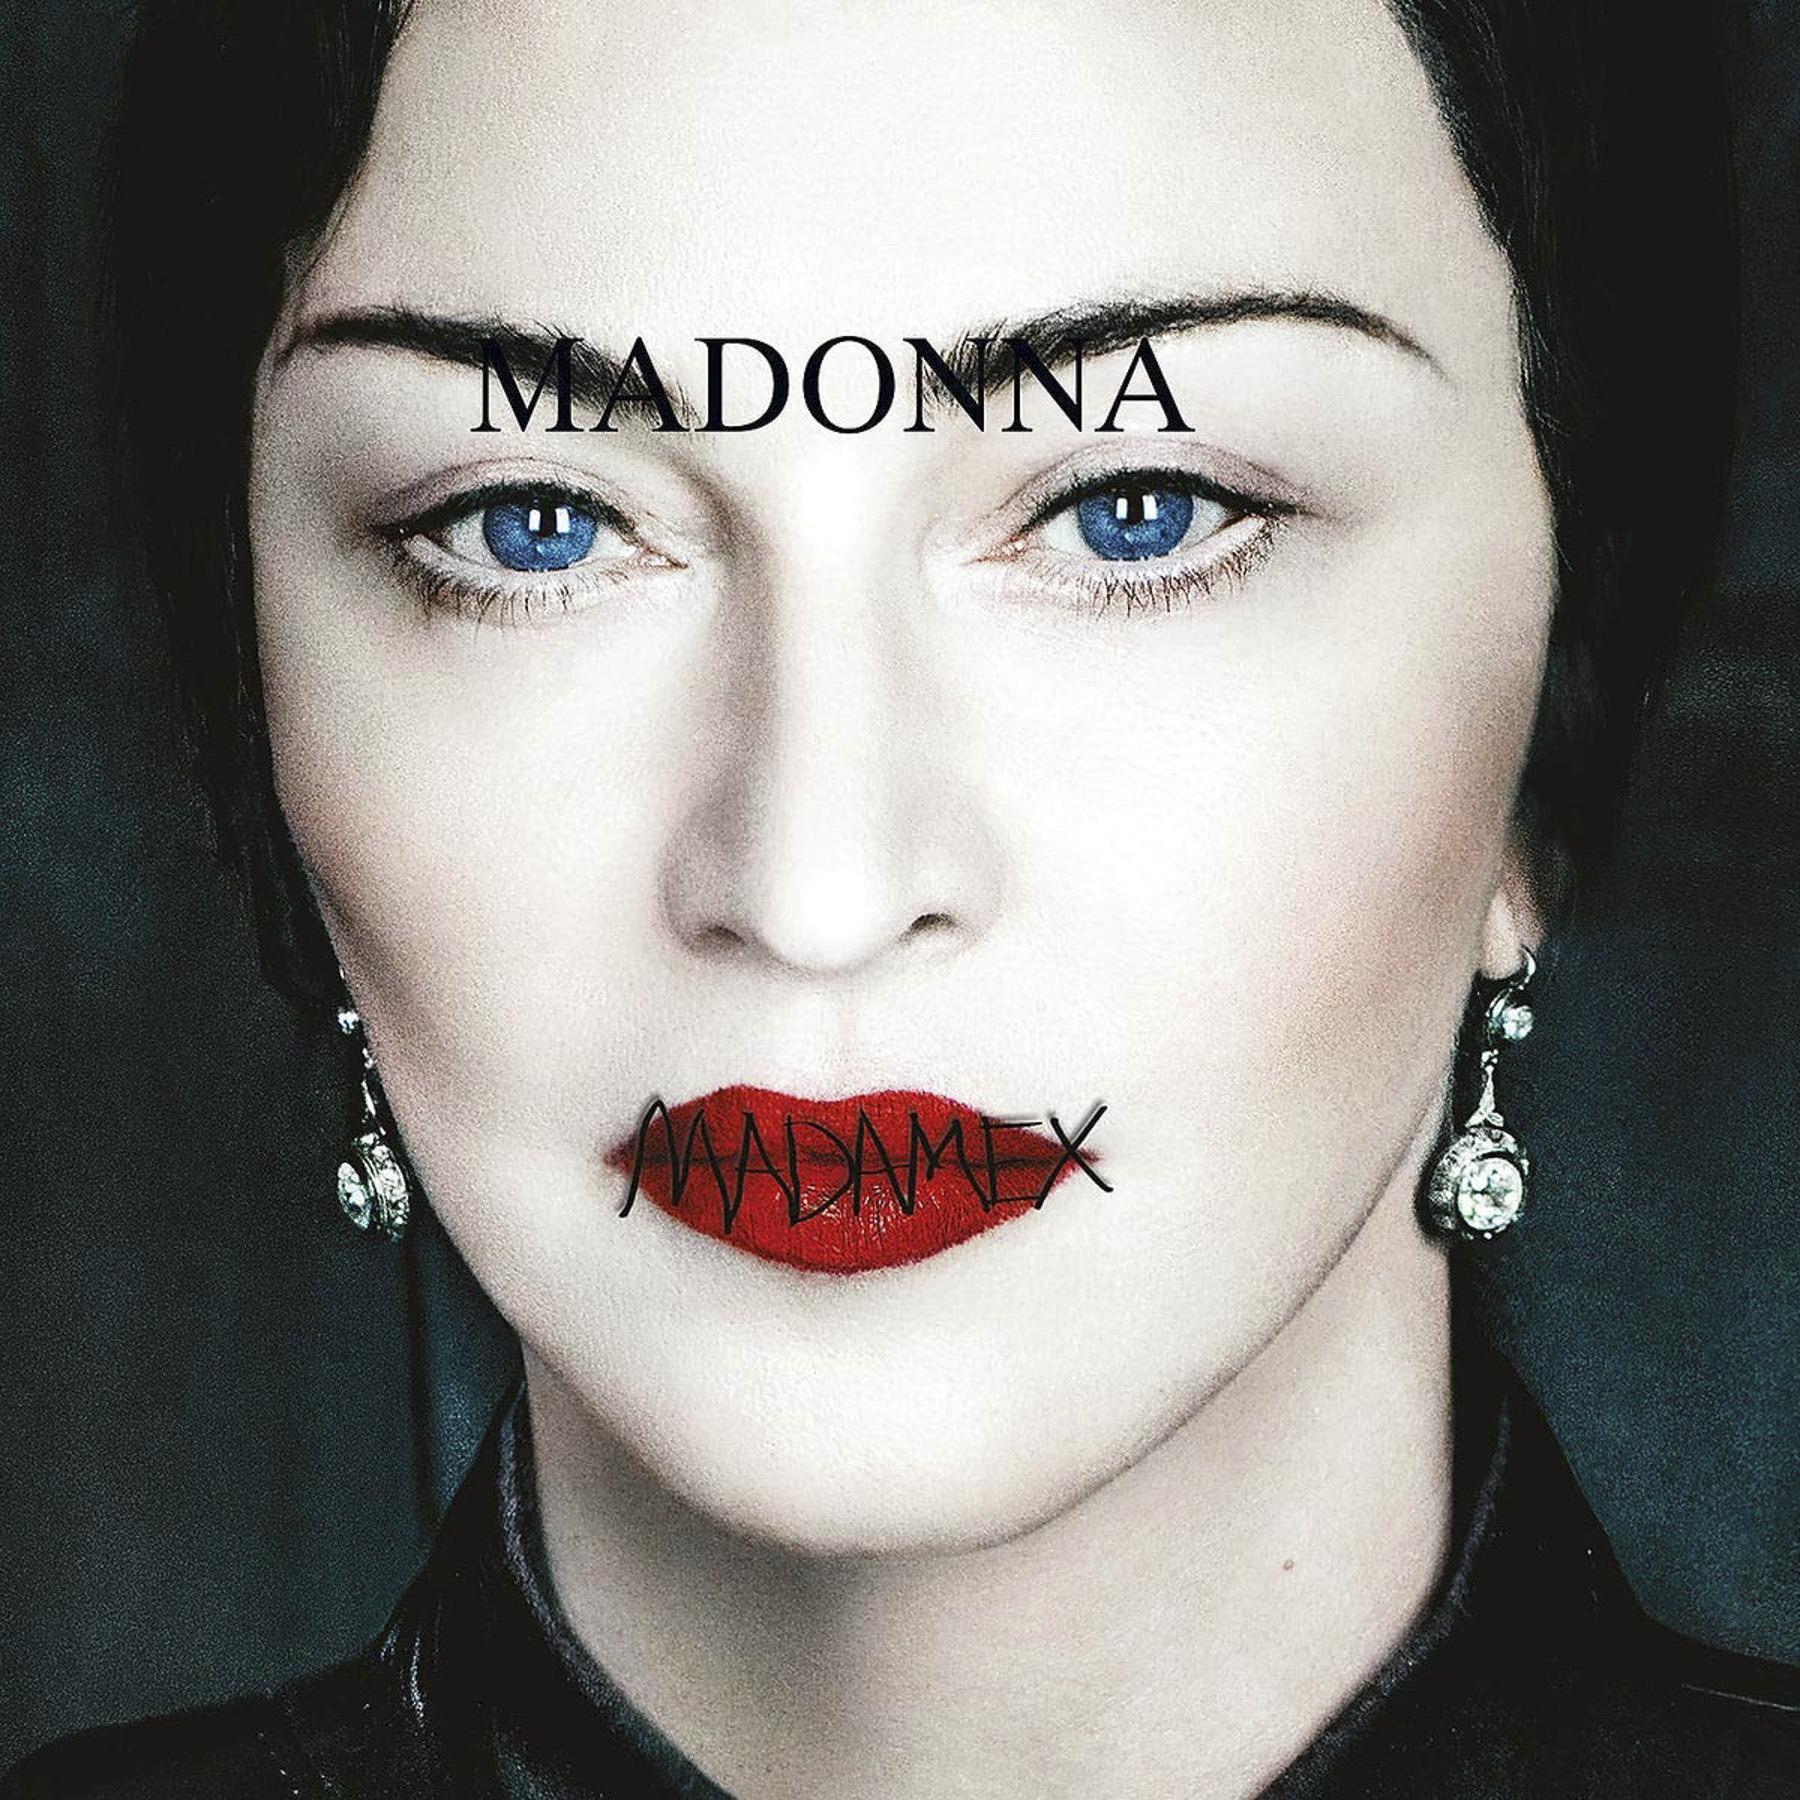 'Madame X' Madonna (June 14, 2019) Label: Interscope